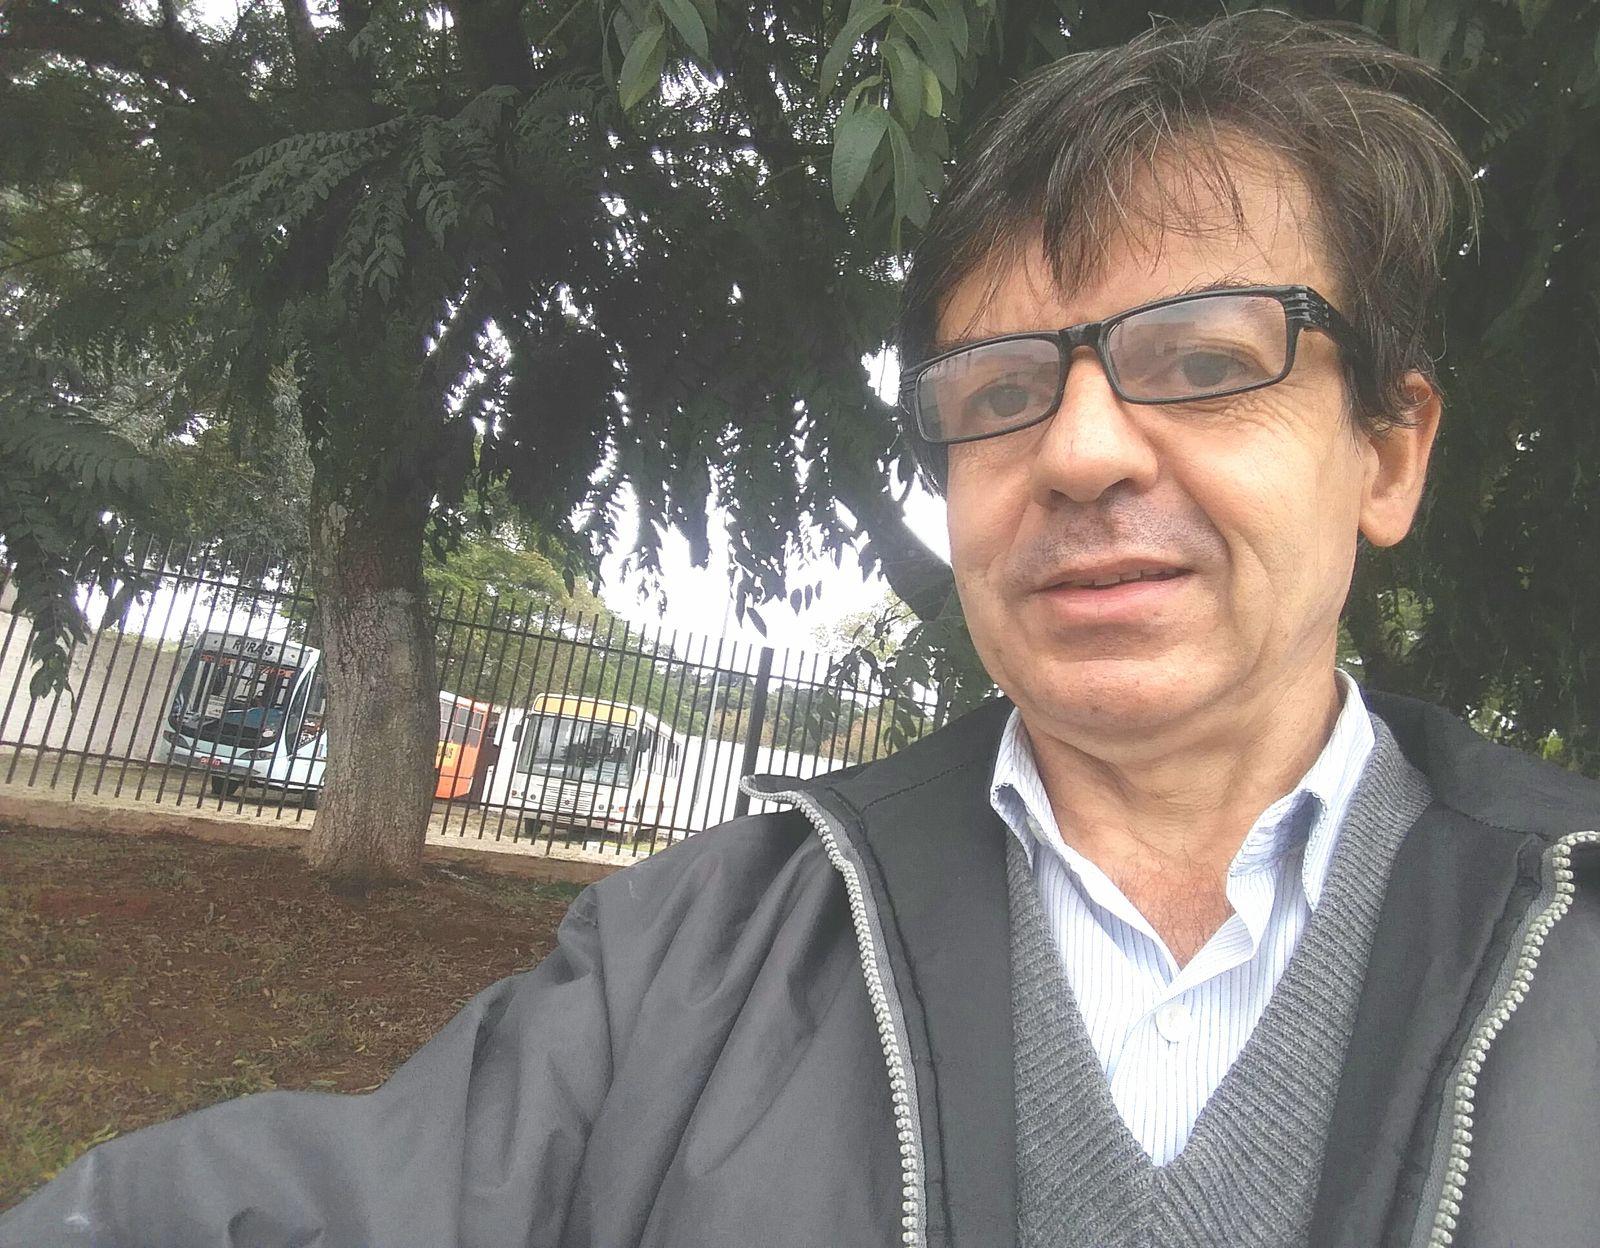 DeCarvalhoJournalist📽 in Nova Campina, San Paolo